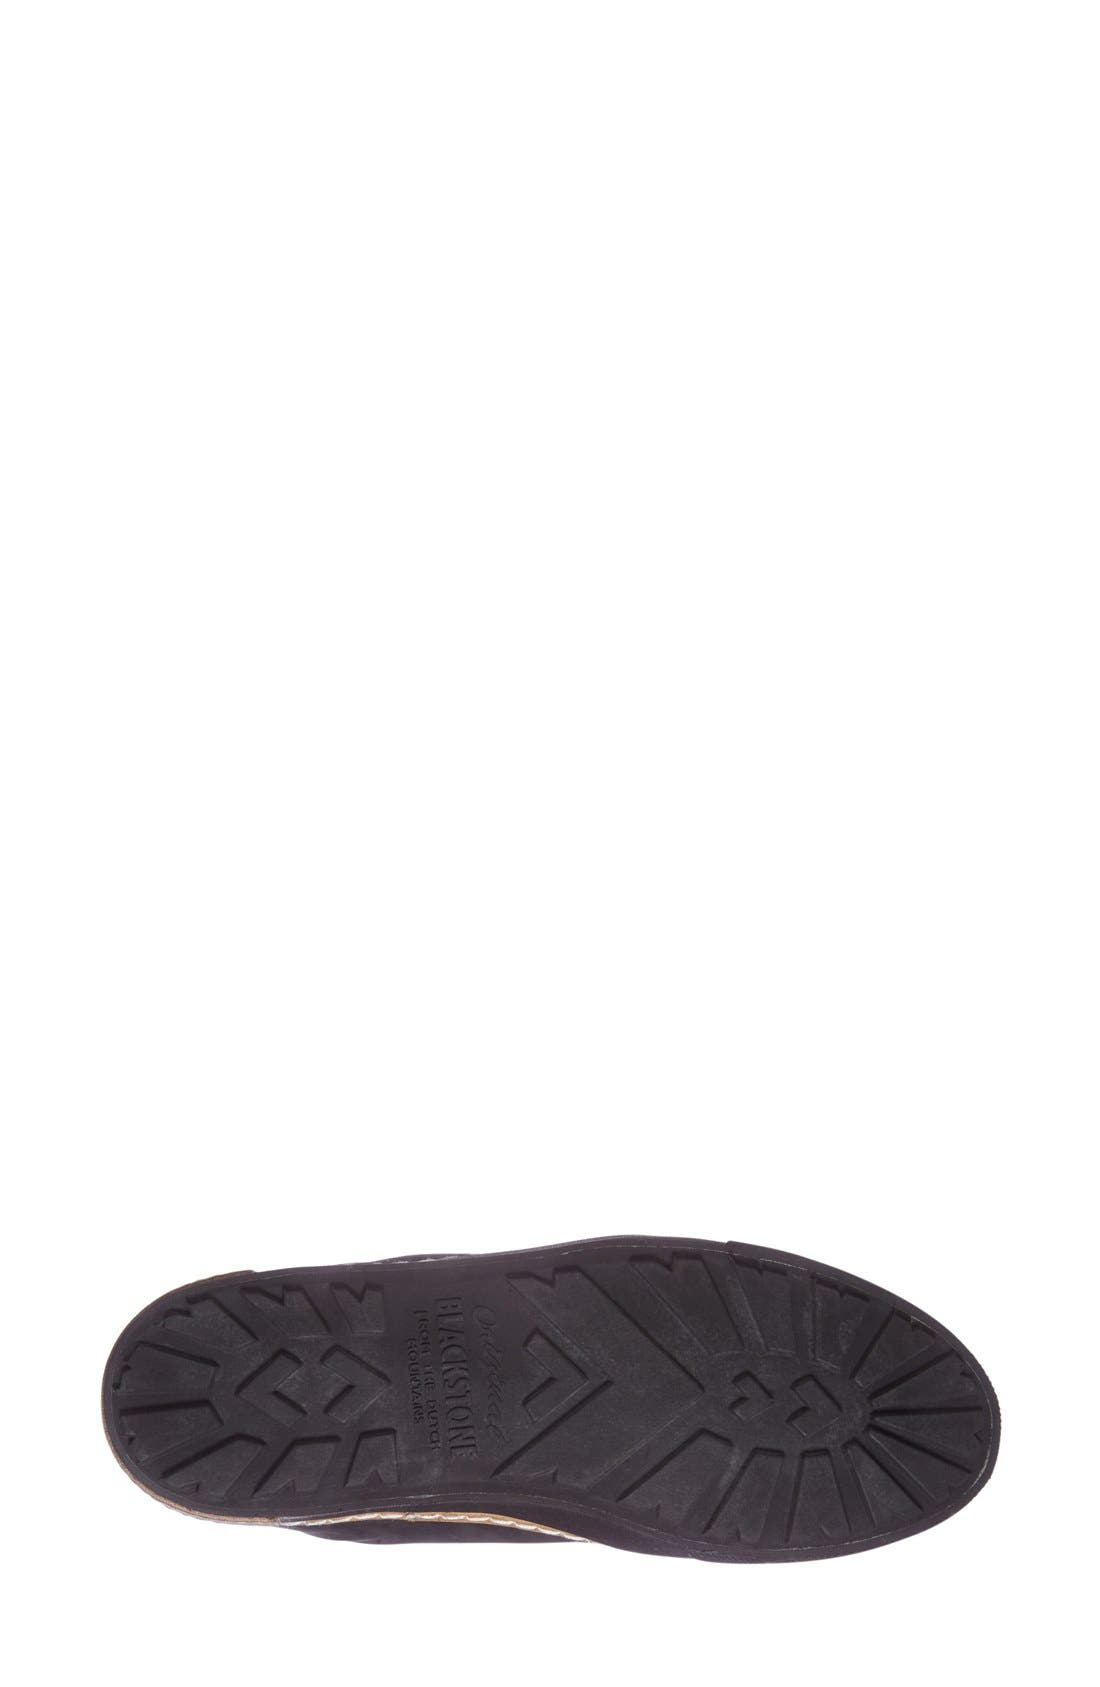 Genuine Calf Hair Zip Chukka Boot,                             Alternate thumbnail 4, color,                             Black Leather